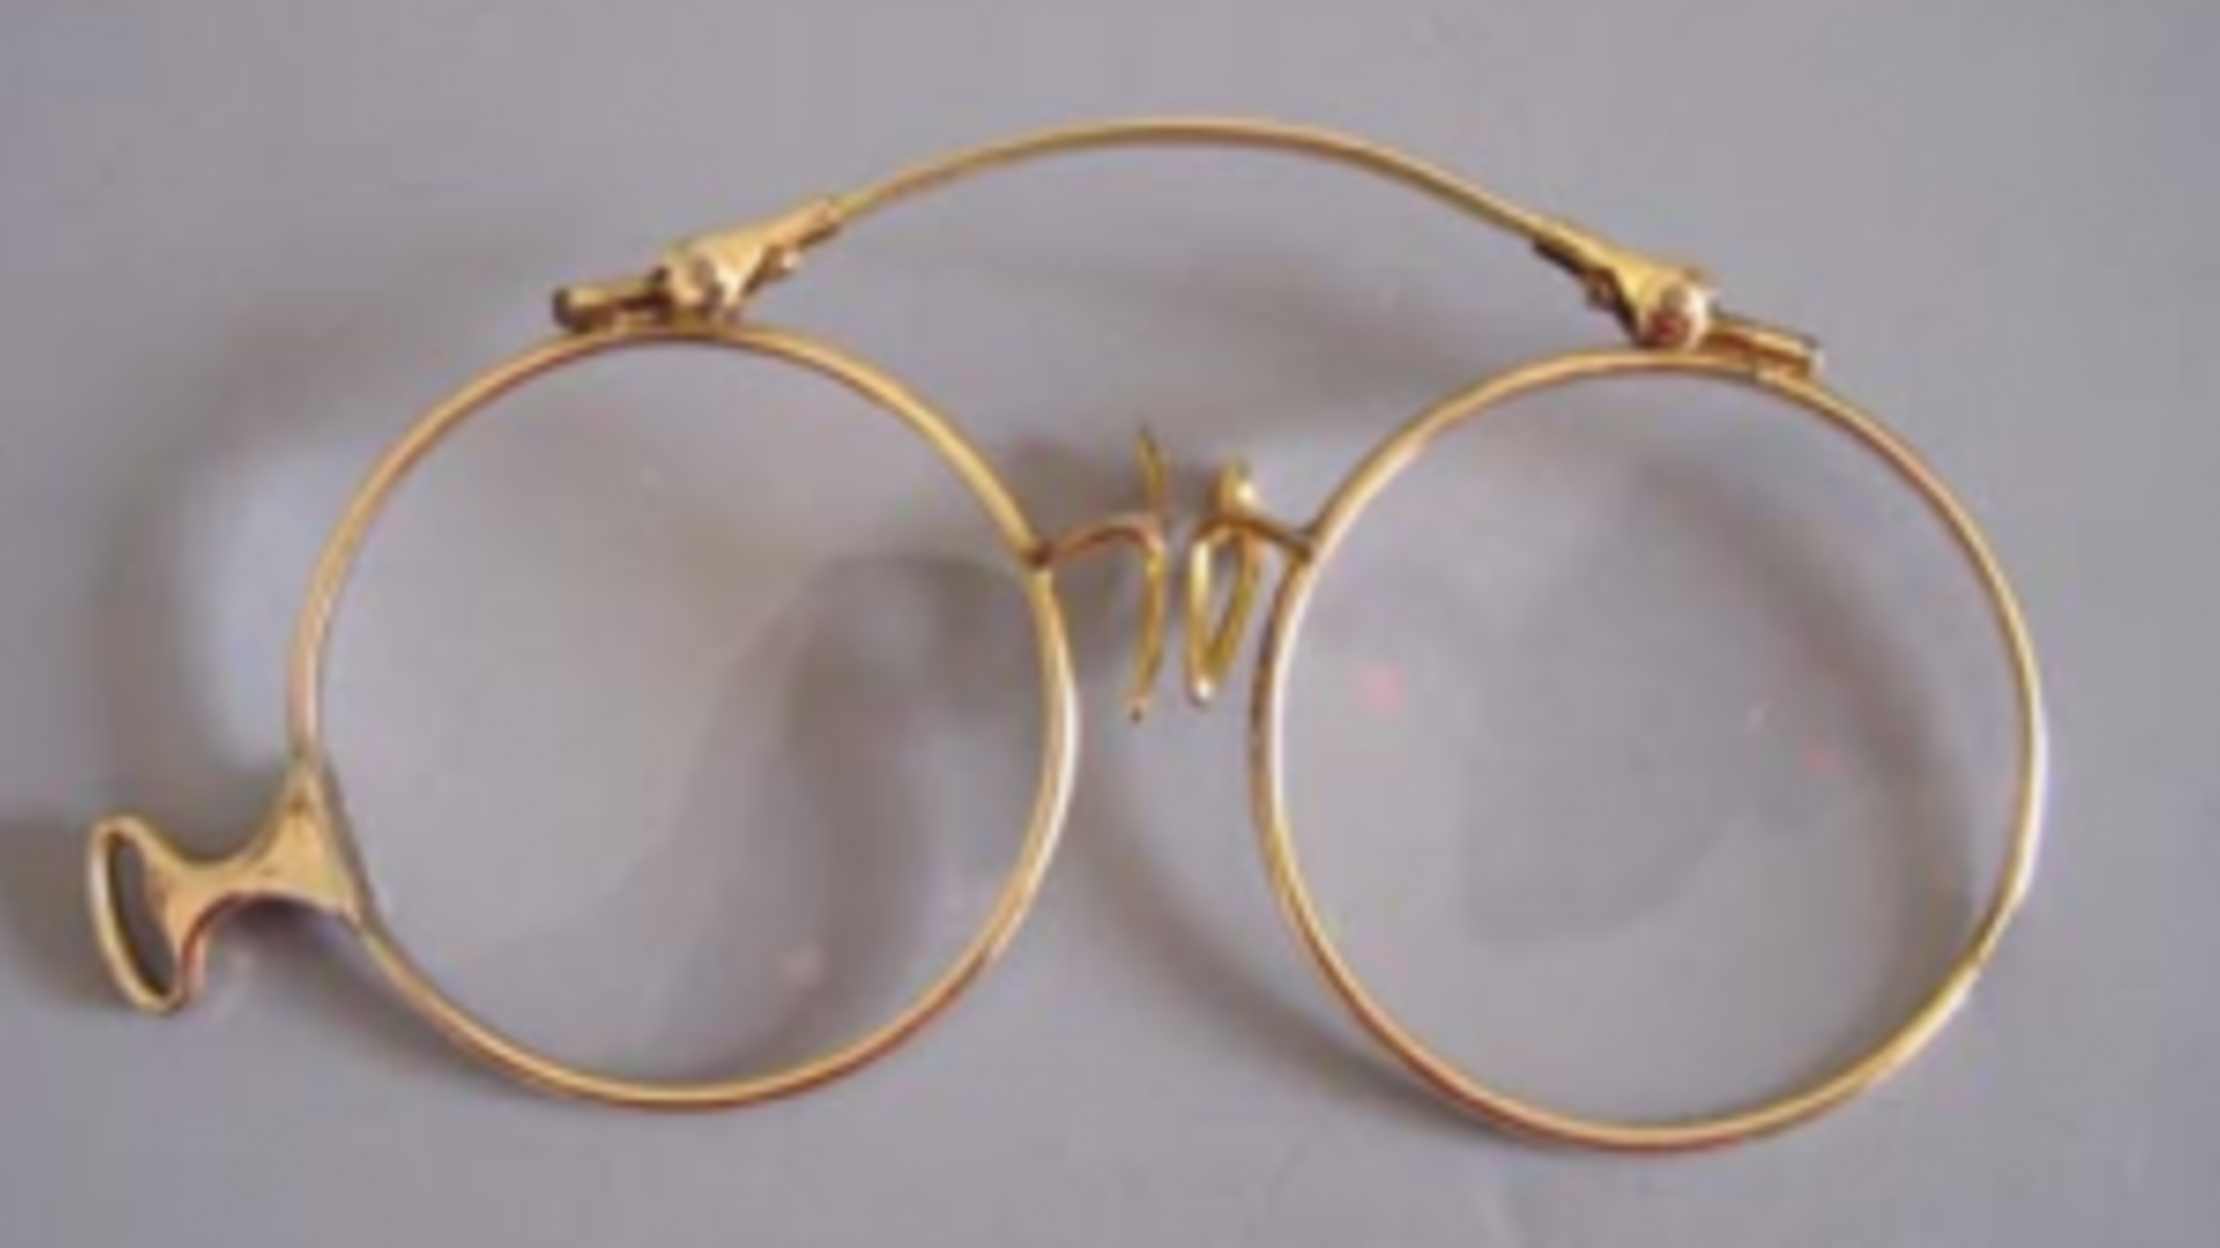 da7c8695dc9c 6 Other Types of Eyeglasses